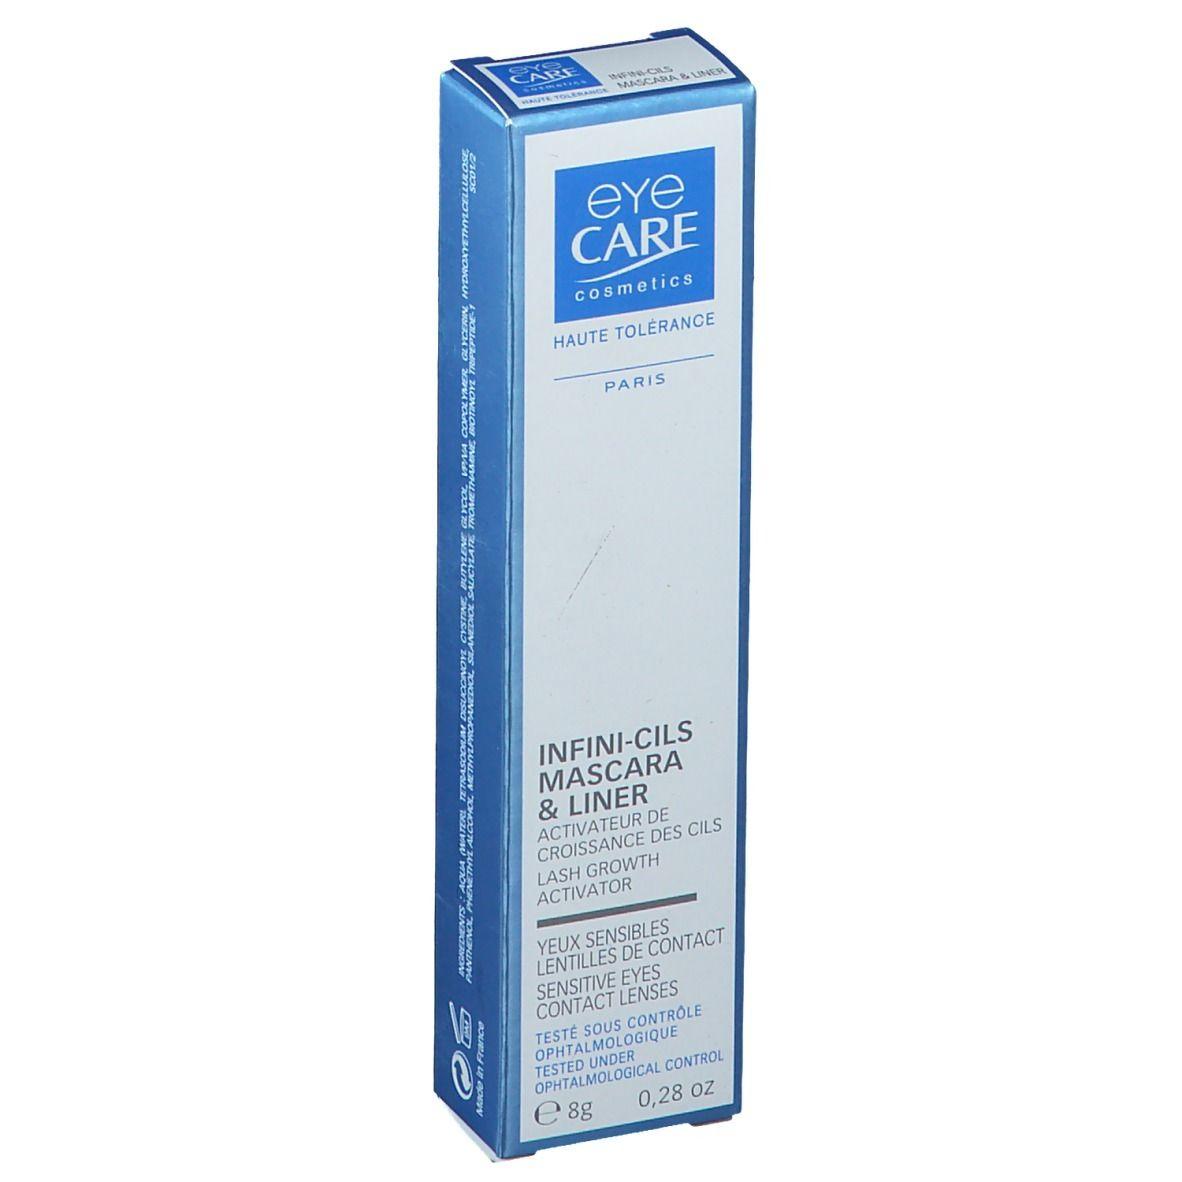 Eye Care Cosmetics Eye Care Infini-Cils Mascara & Liner pc(s) crayon(s)